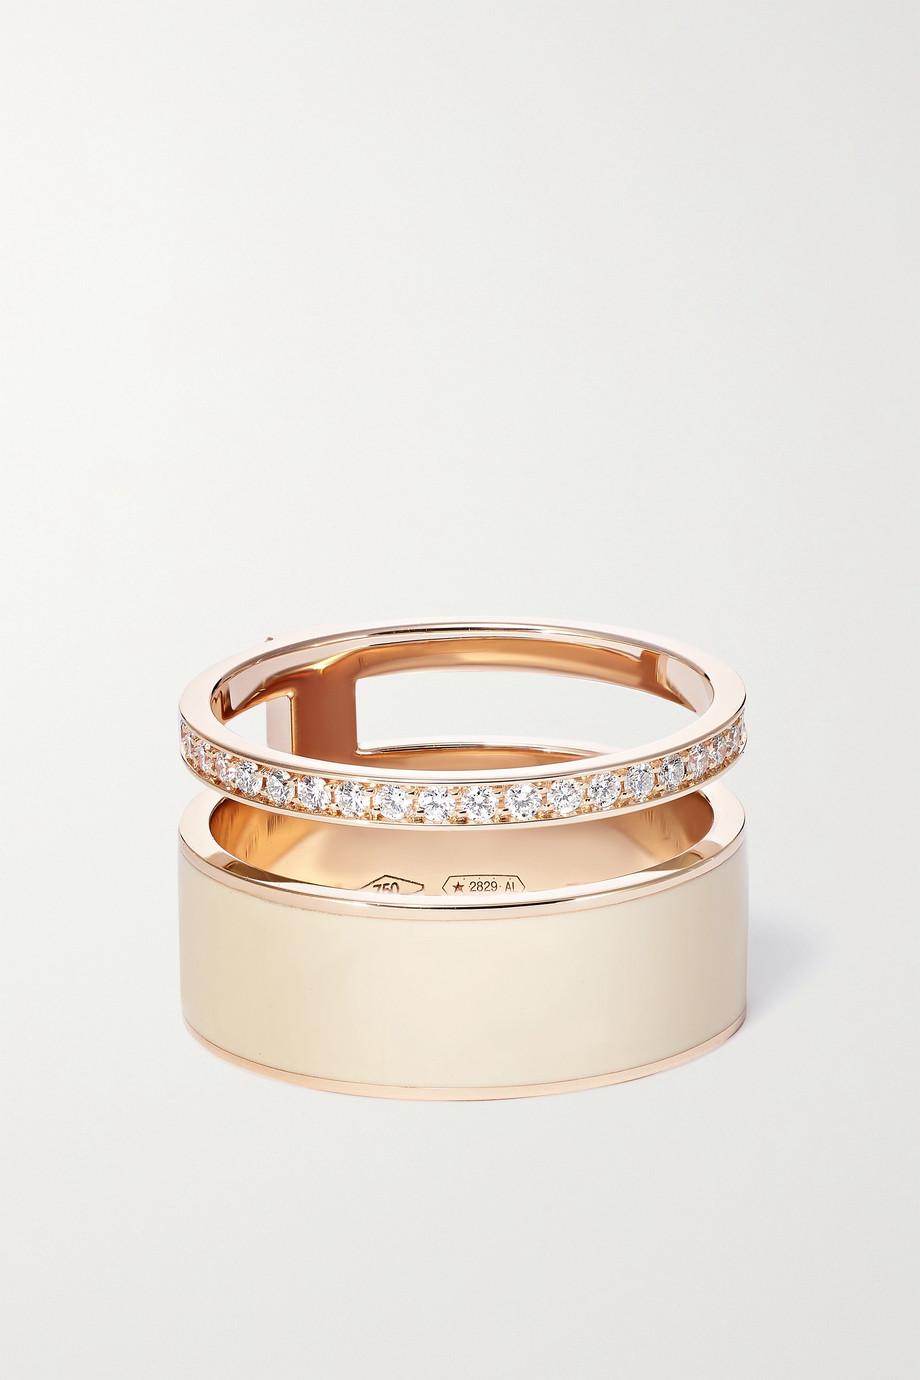 Repossi Bague en or rose 18 carats, émail et diamants Berbere